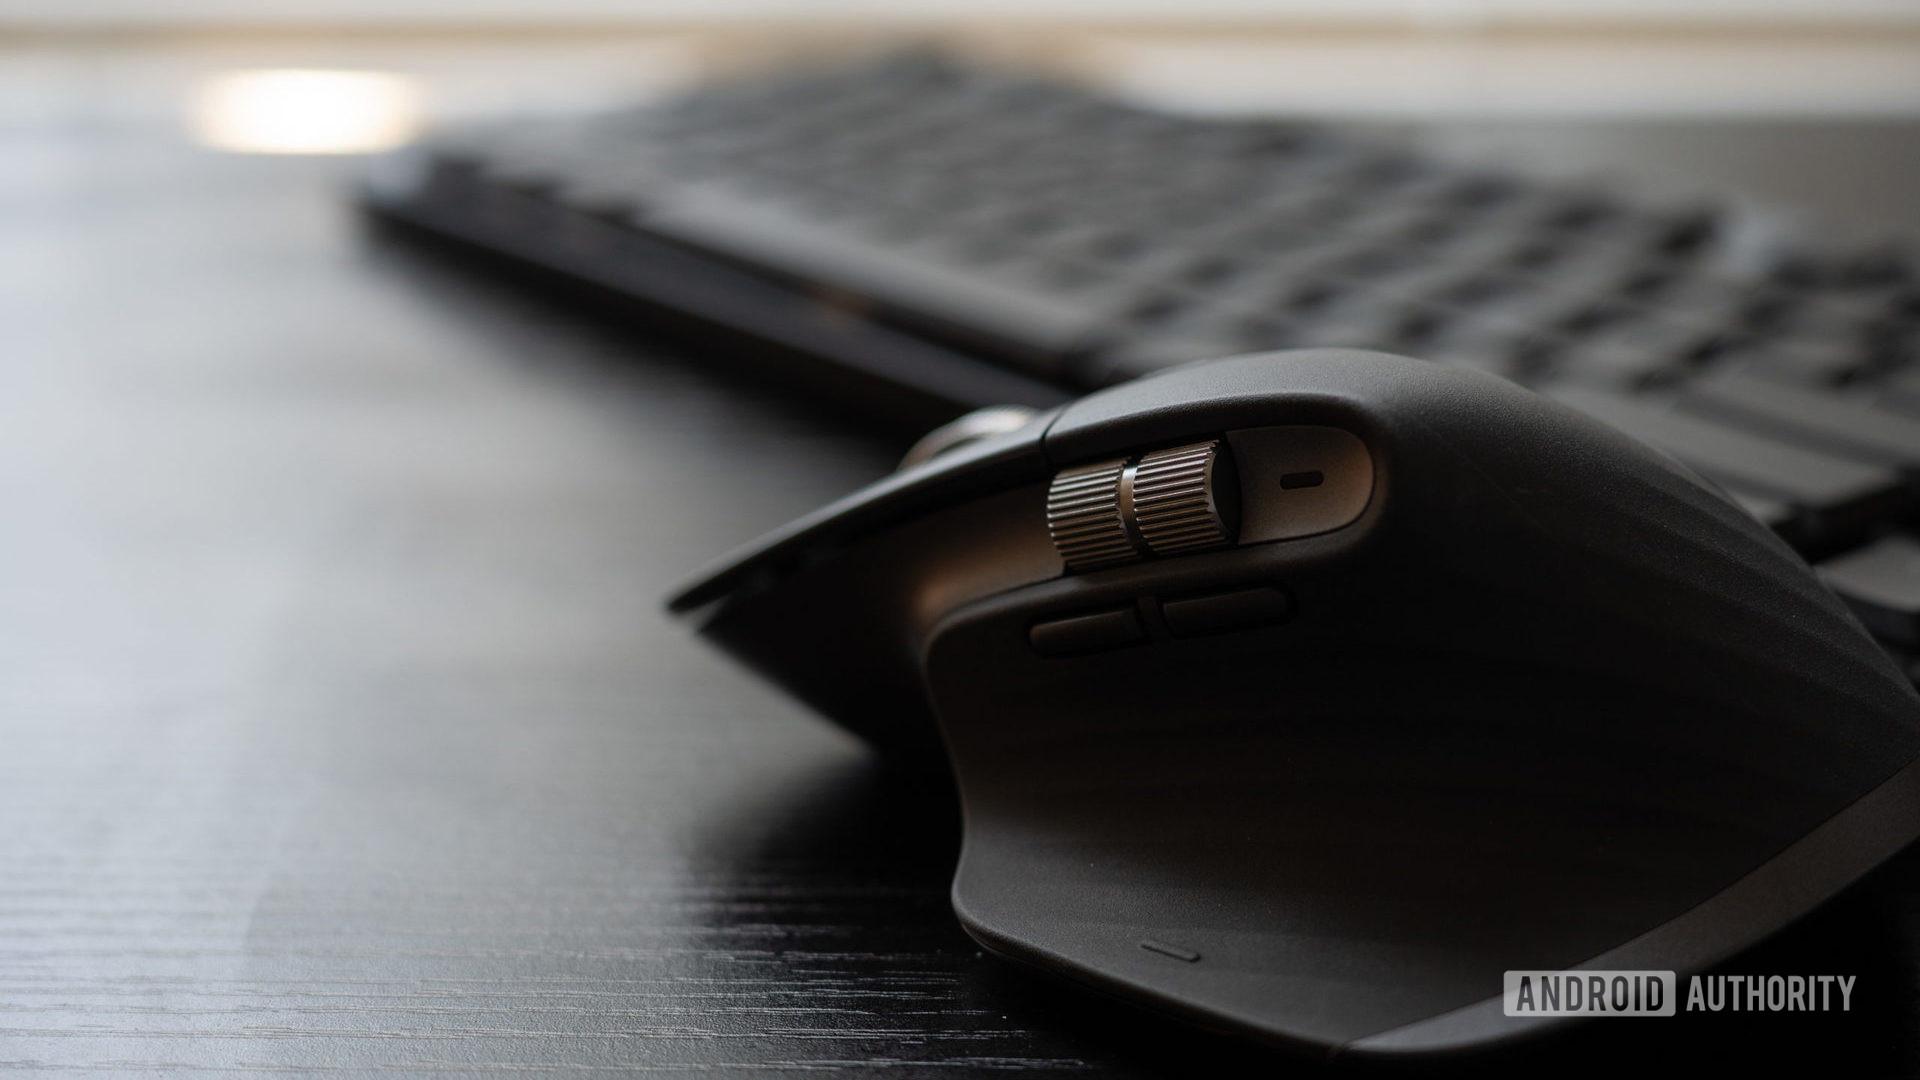 MX Master 3 beside G915 keyboard